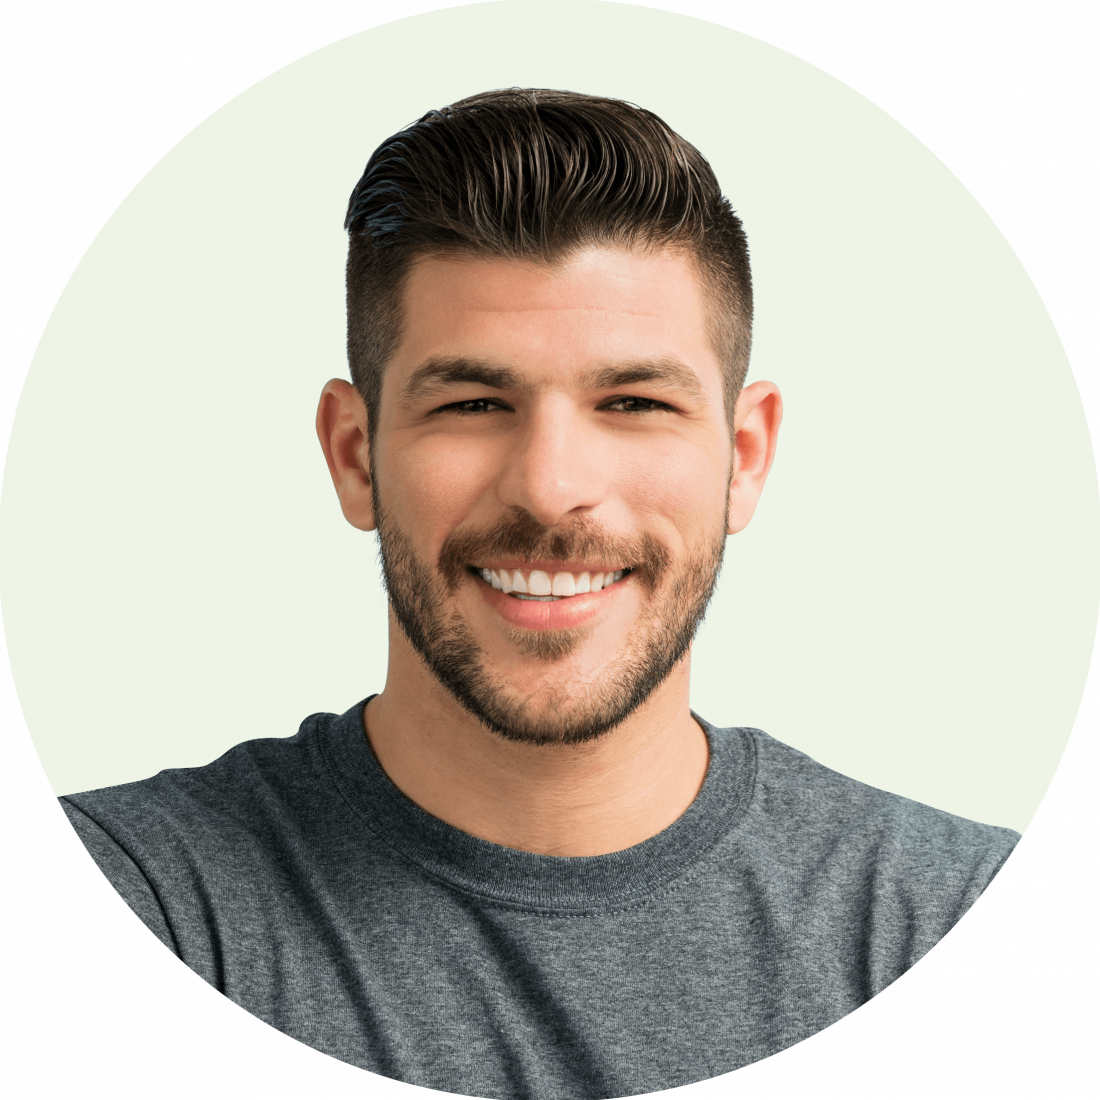 Why men choose Beard Transplantation?